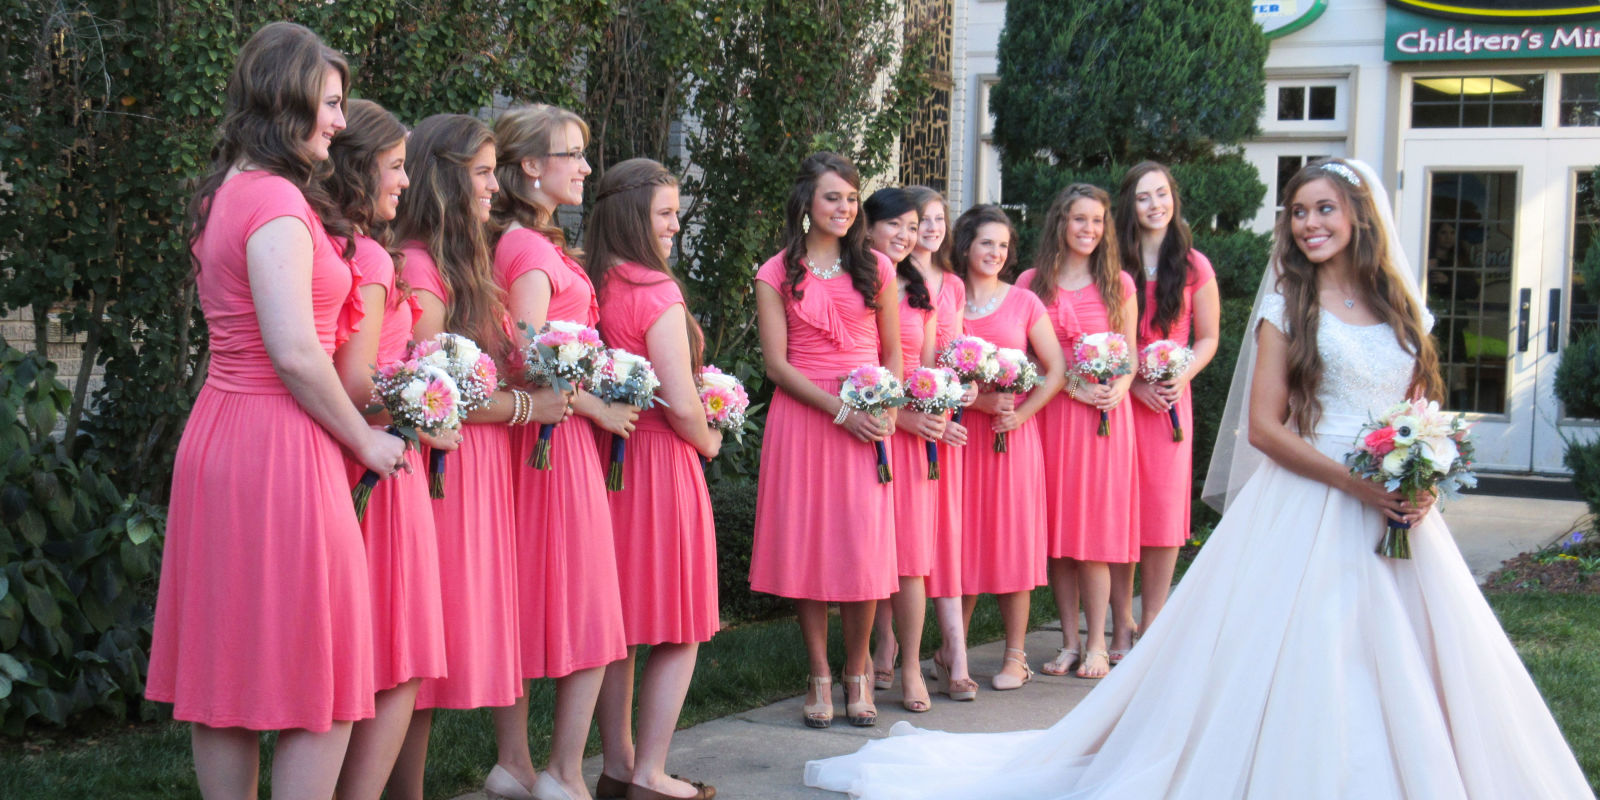 Modern wedding dresses for young: Bridesmaid dresses at jill ...